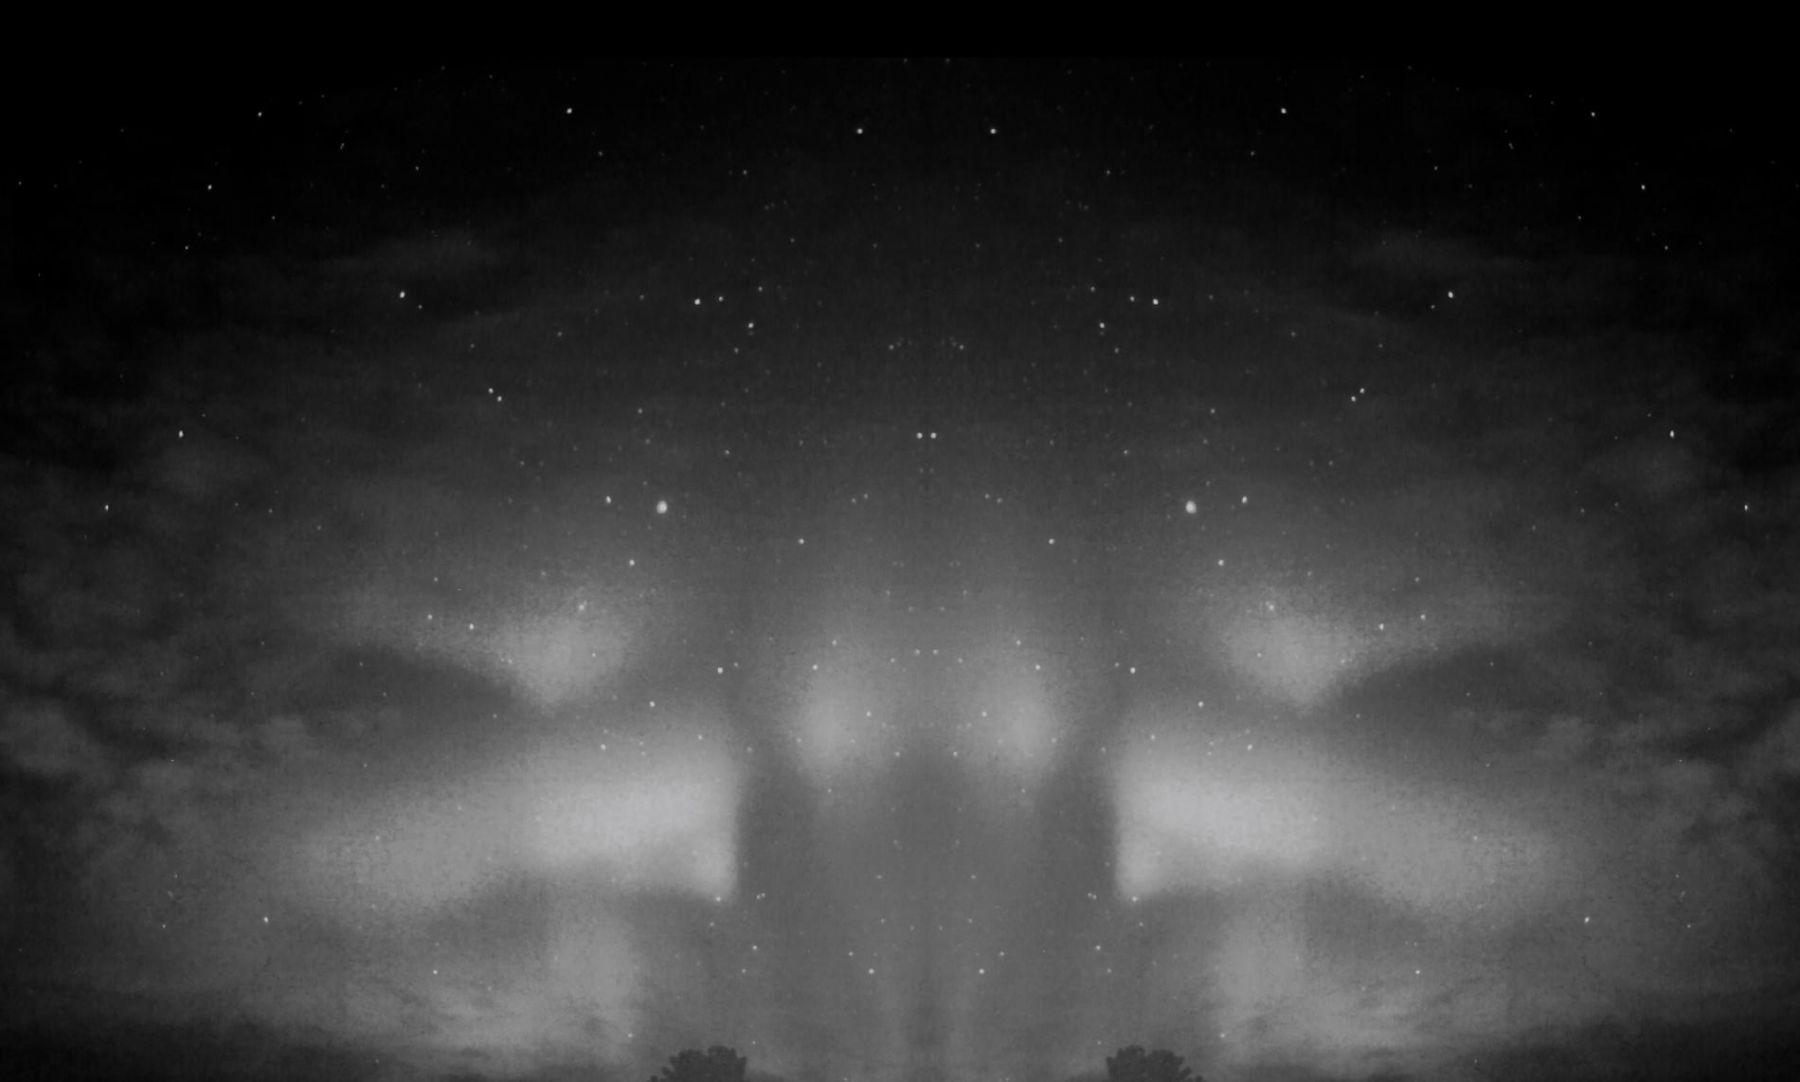 , HIRAKI SAWA Aurora, 2013 Single channel black and white video with custom monitor Duration: 1 minute 30 seconds Edition of 8